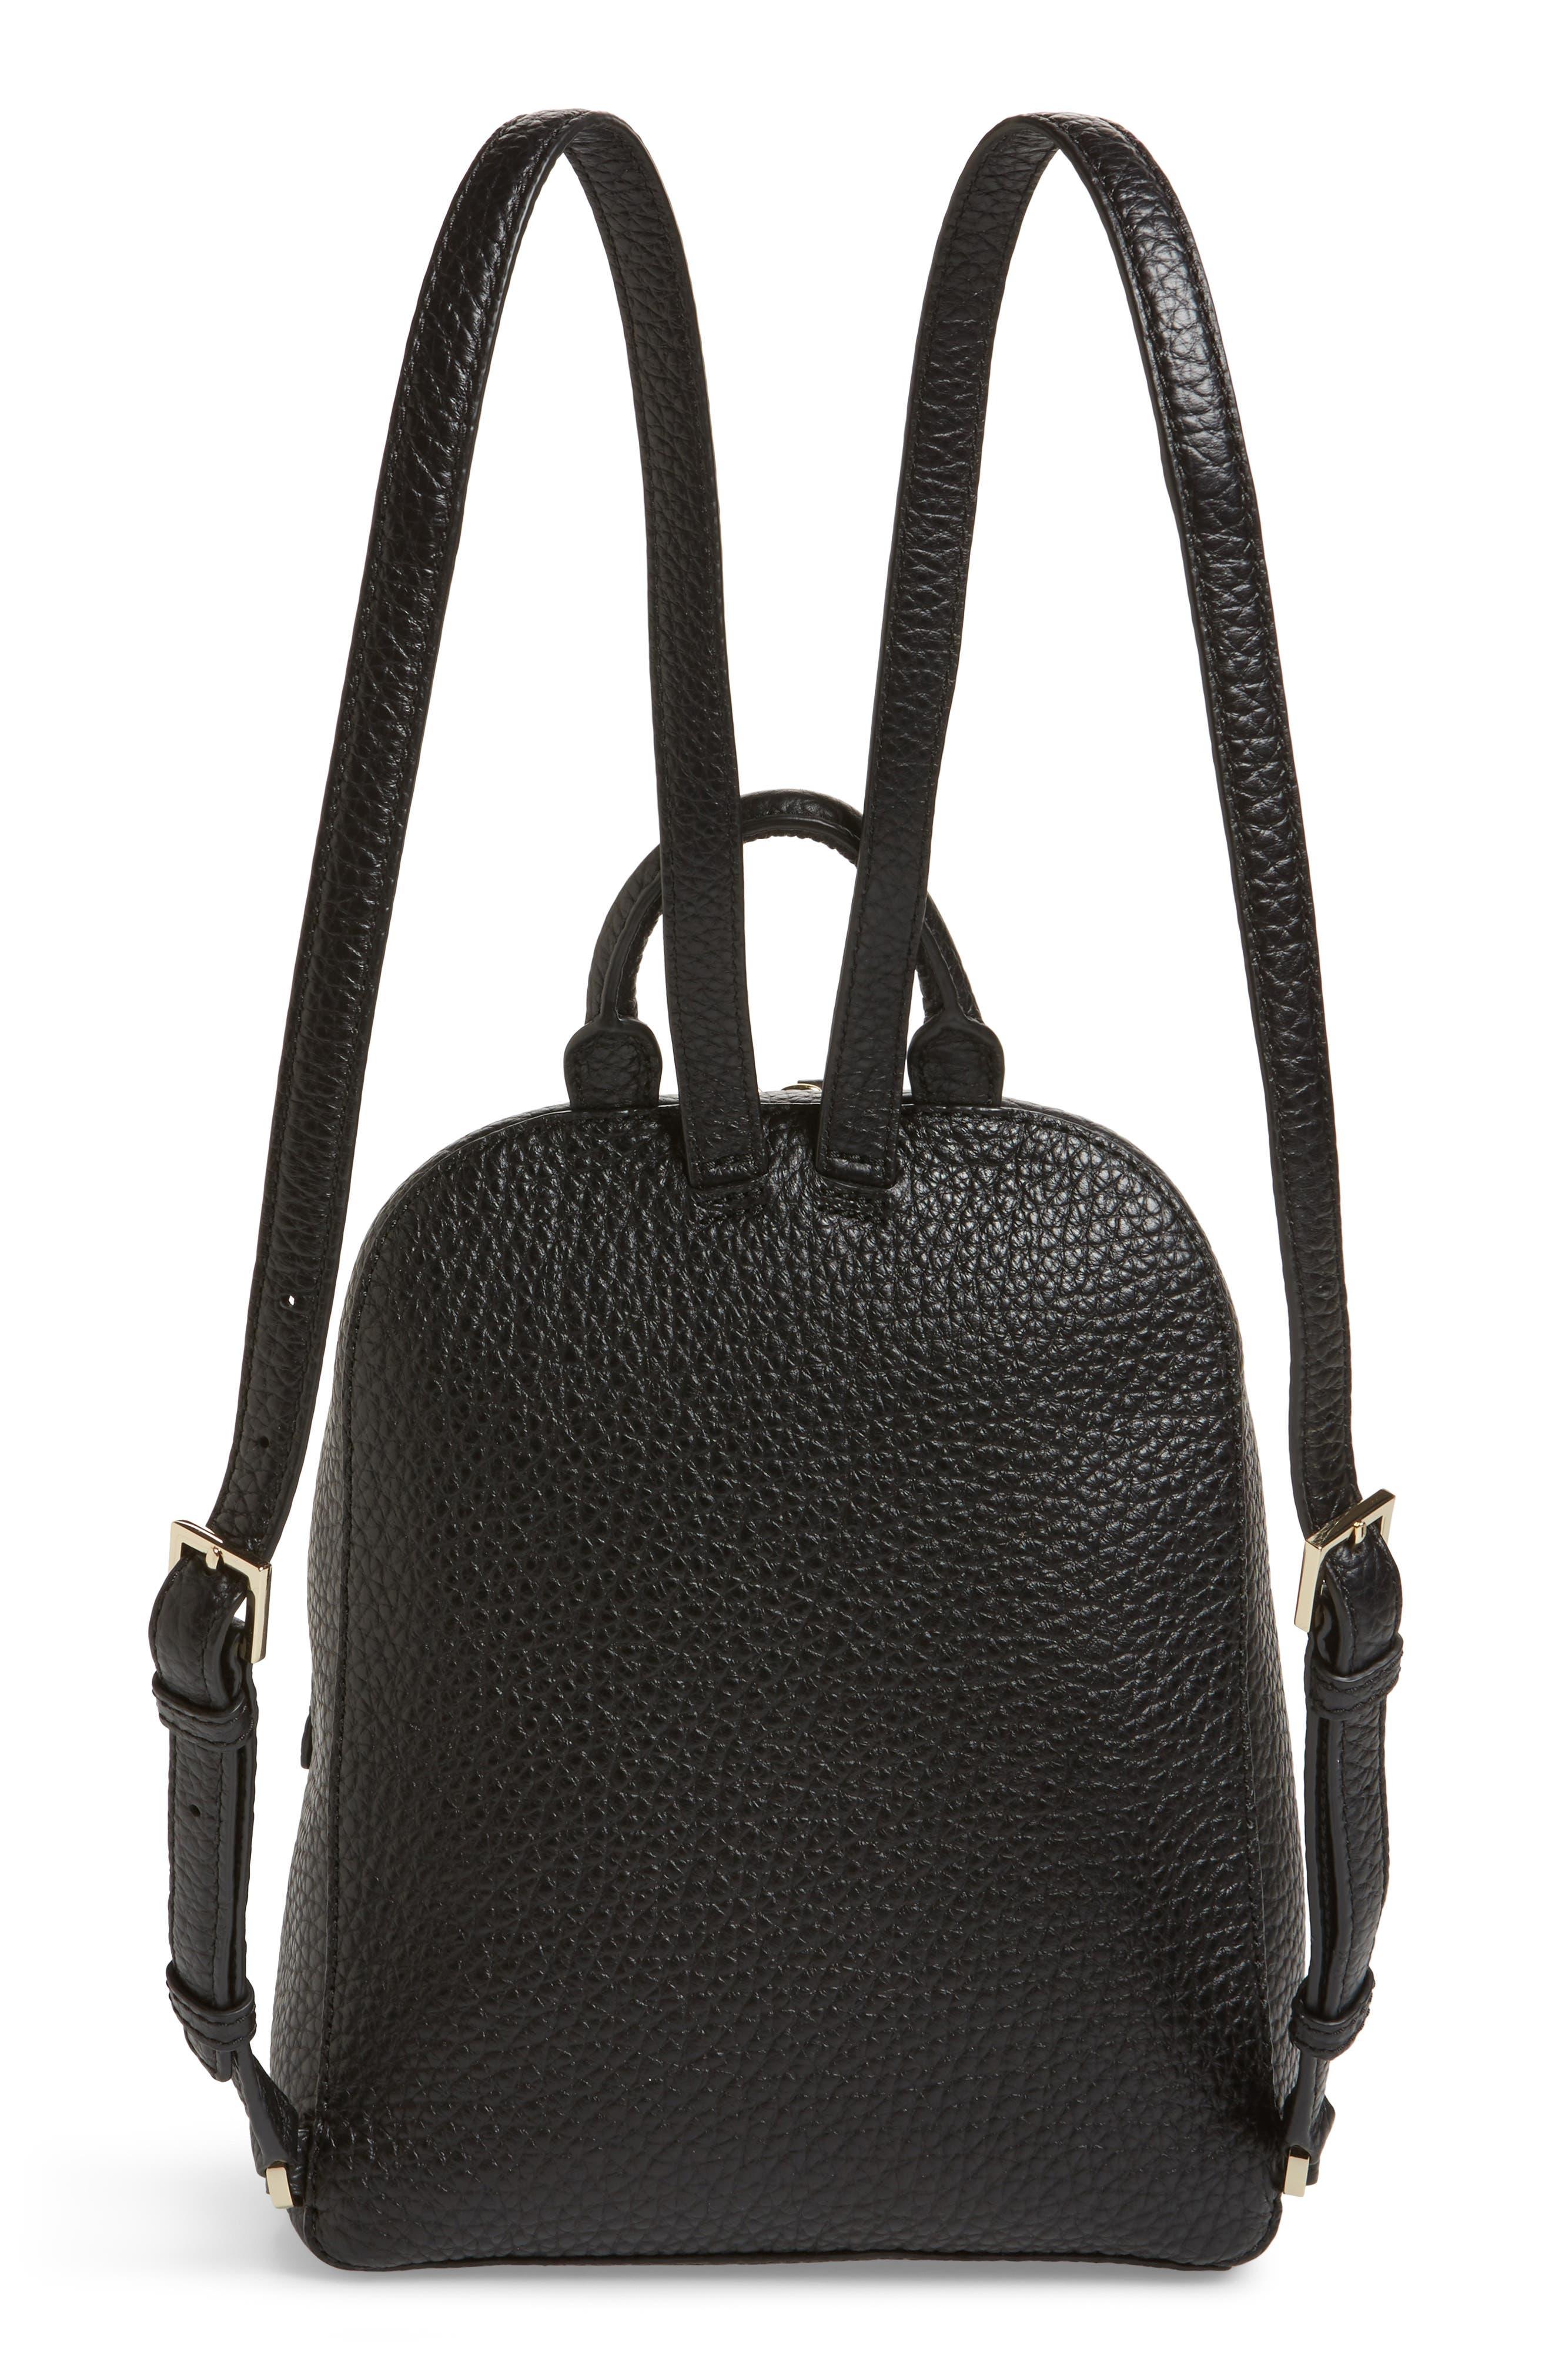 carter street - caden leather backpack,                             Alternate thumbnail 3, color,                             Black